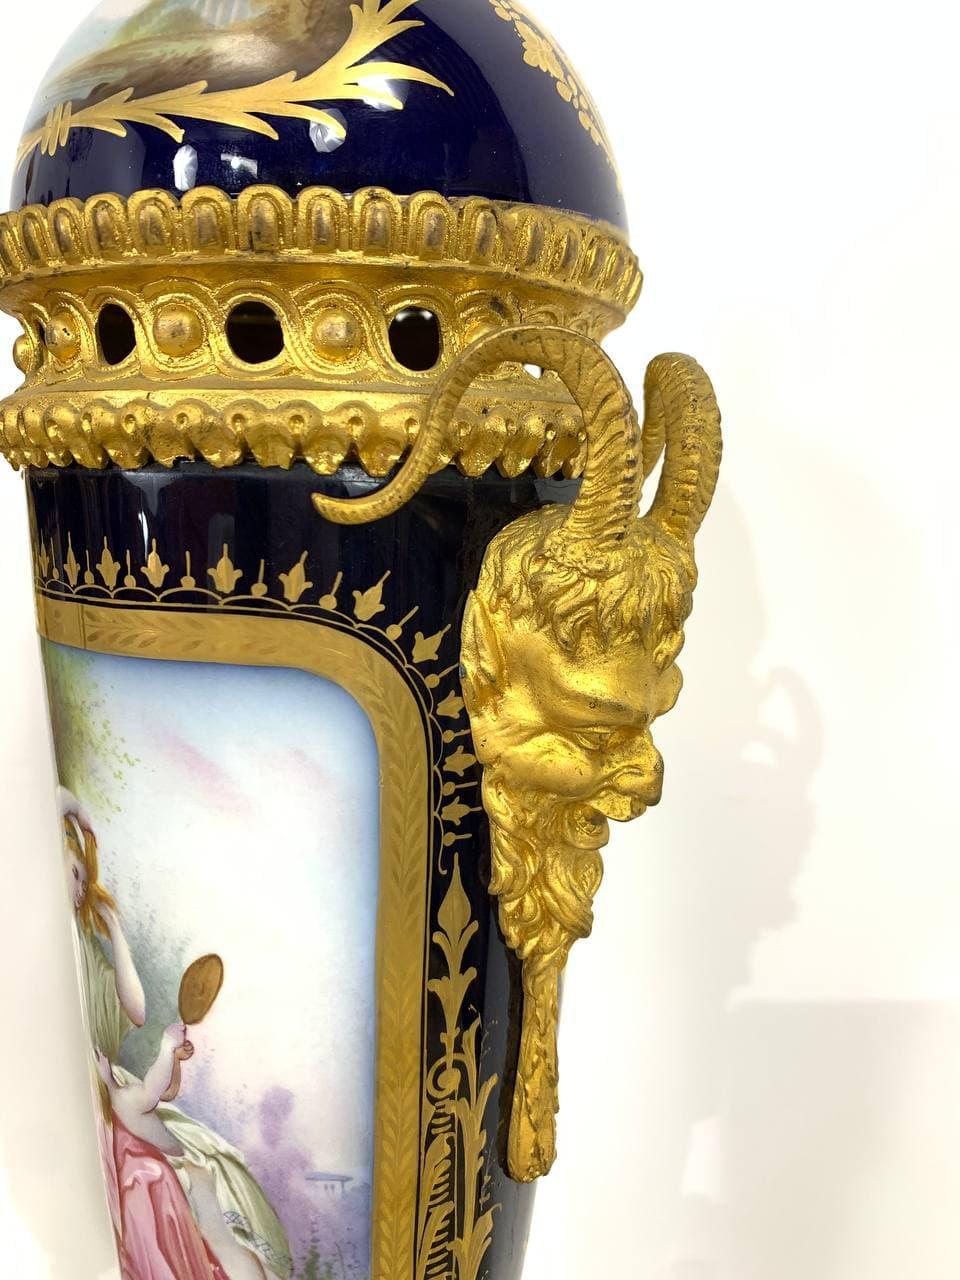 Антикварные вазы мануфактуры Севр